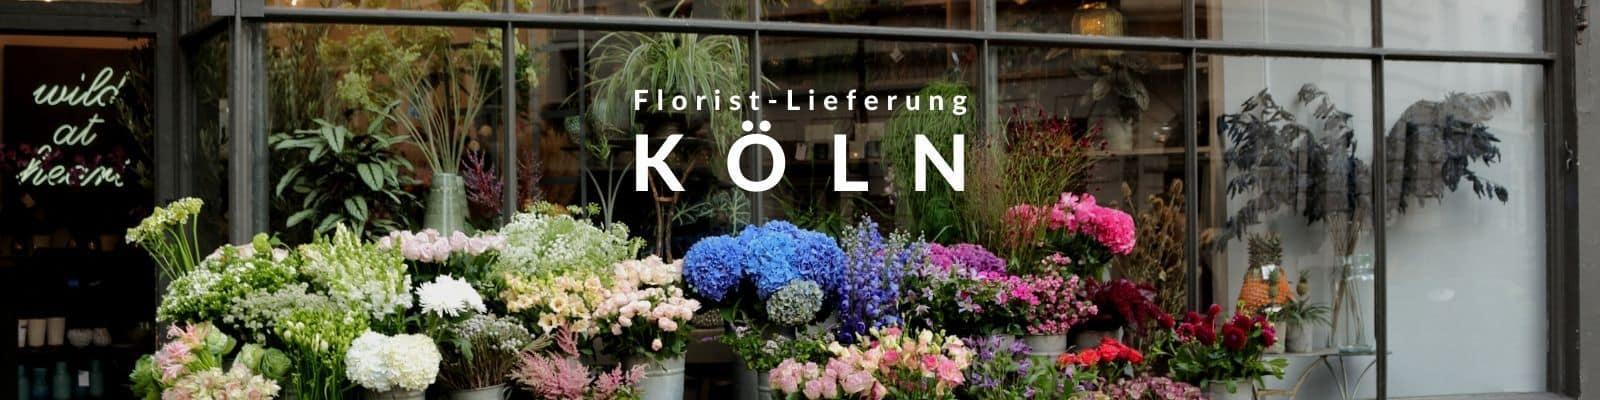 Blumen verschicken Köln - Blumenversand Express